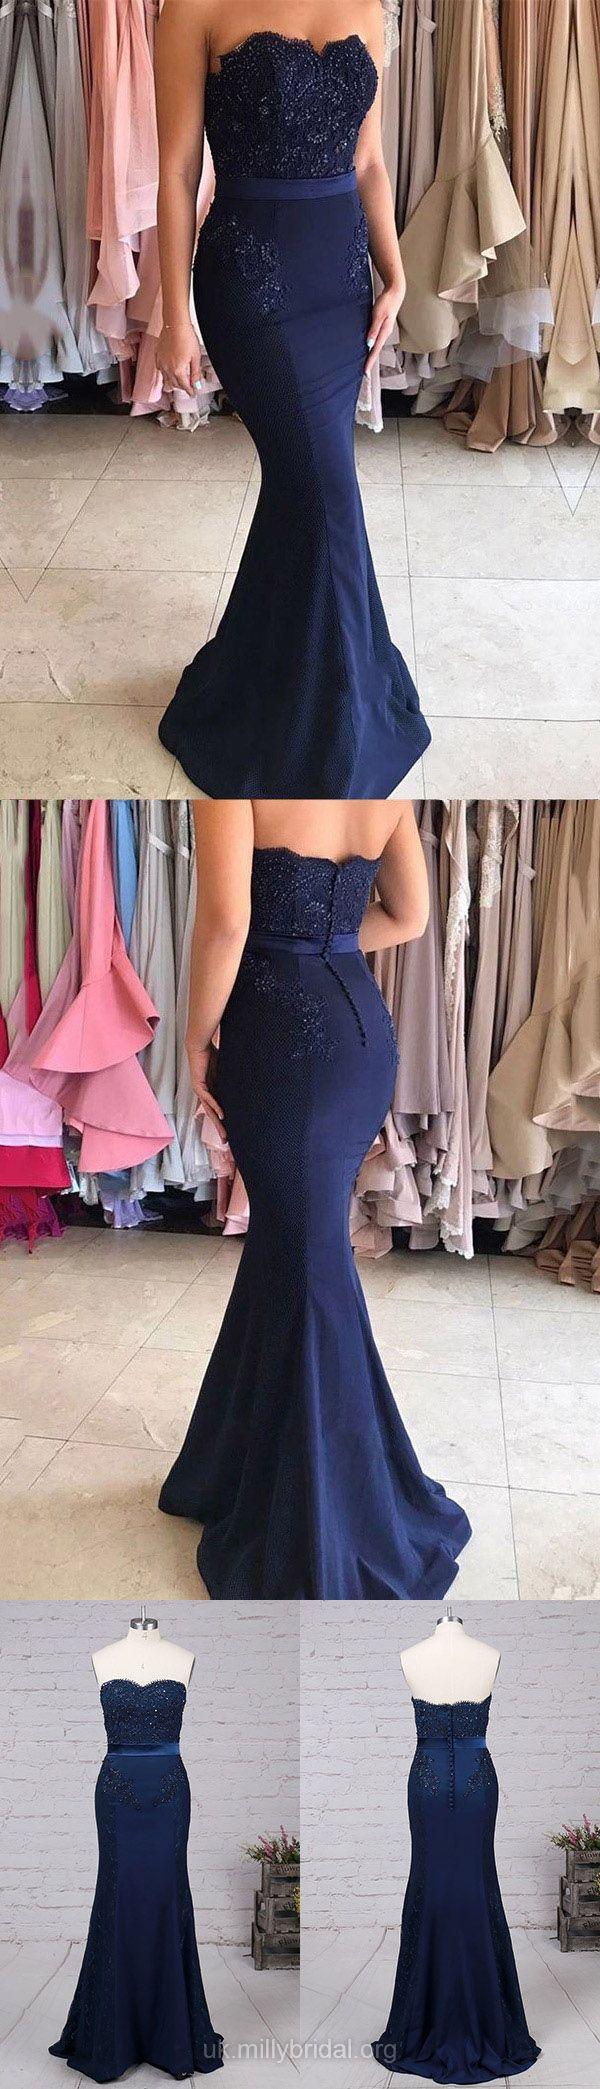 Prom Dresses, Long Prom Dresses Trumpet/Mermaid, Sweetheart Prom Dresses Silk-like Satin with Appliques, Lace Prom Dresses Modest #lace #prom